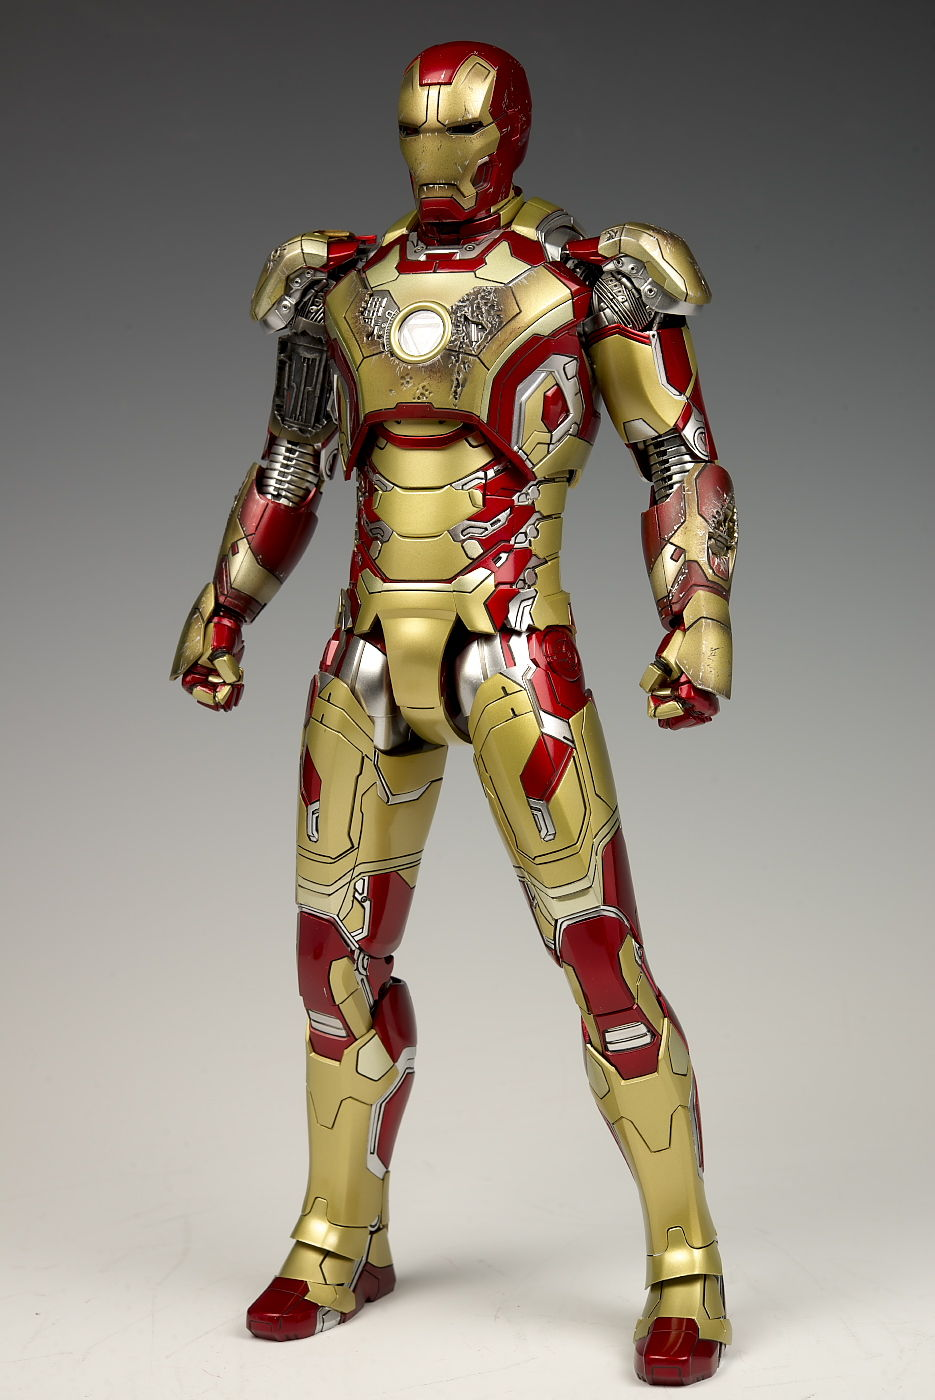 Hot Toys Mms Diecast Series 1 6 Iron Man 3 Mark Xlii